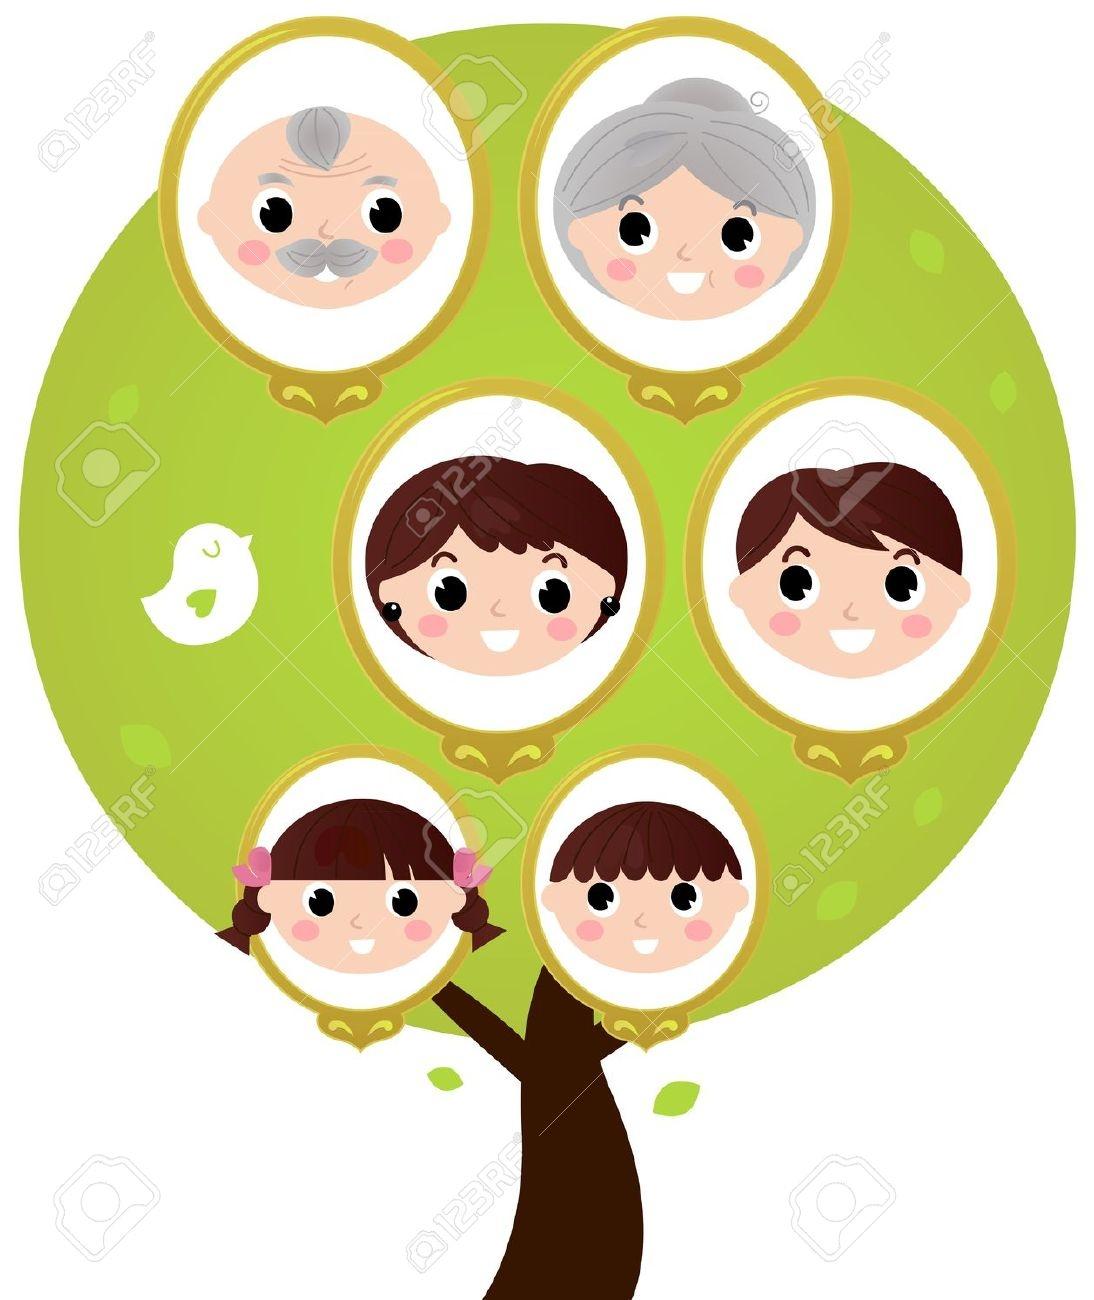 1094x1300 Clip Art Clip Art Of Family Tree